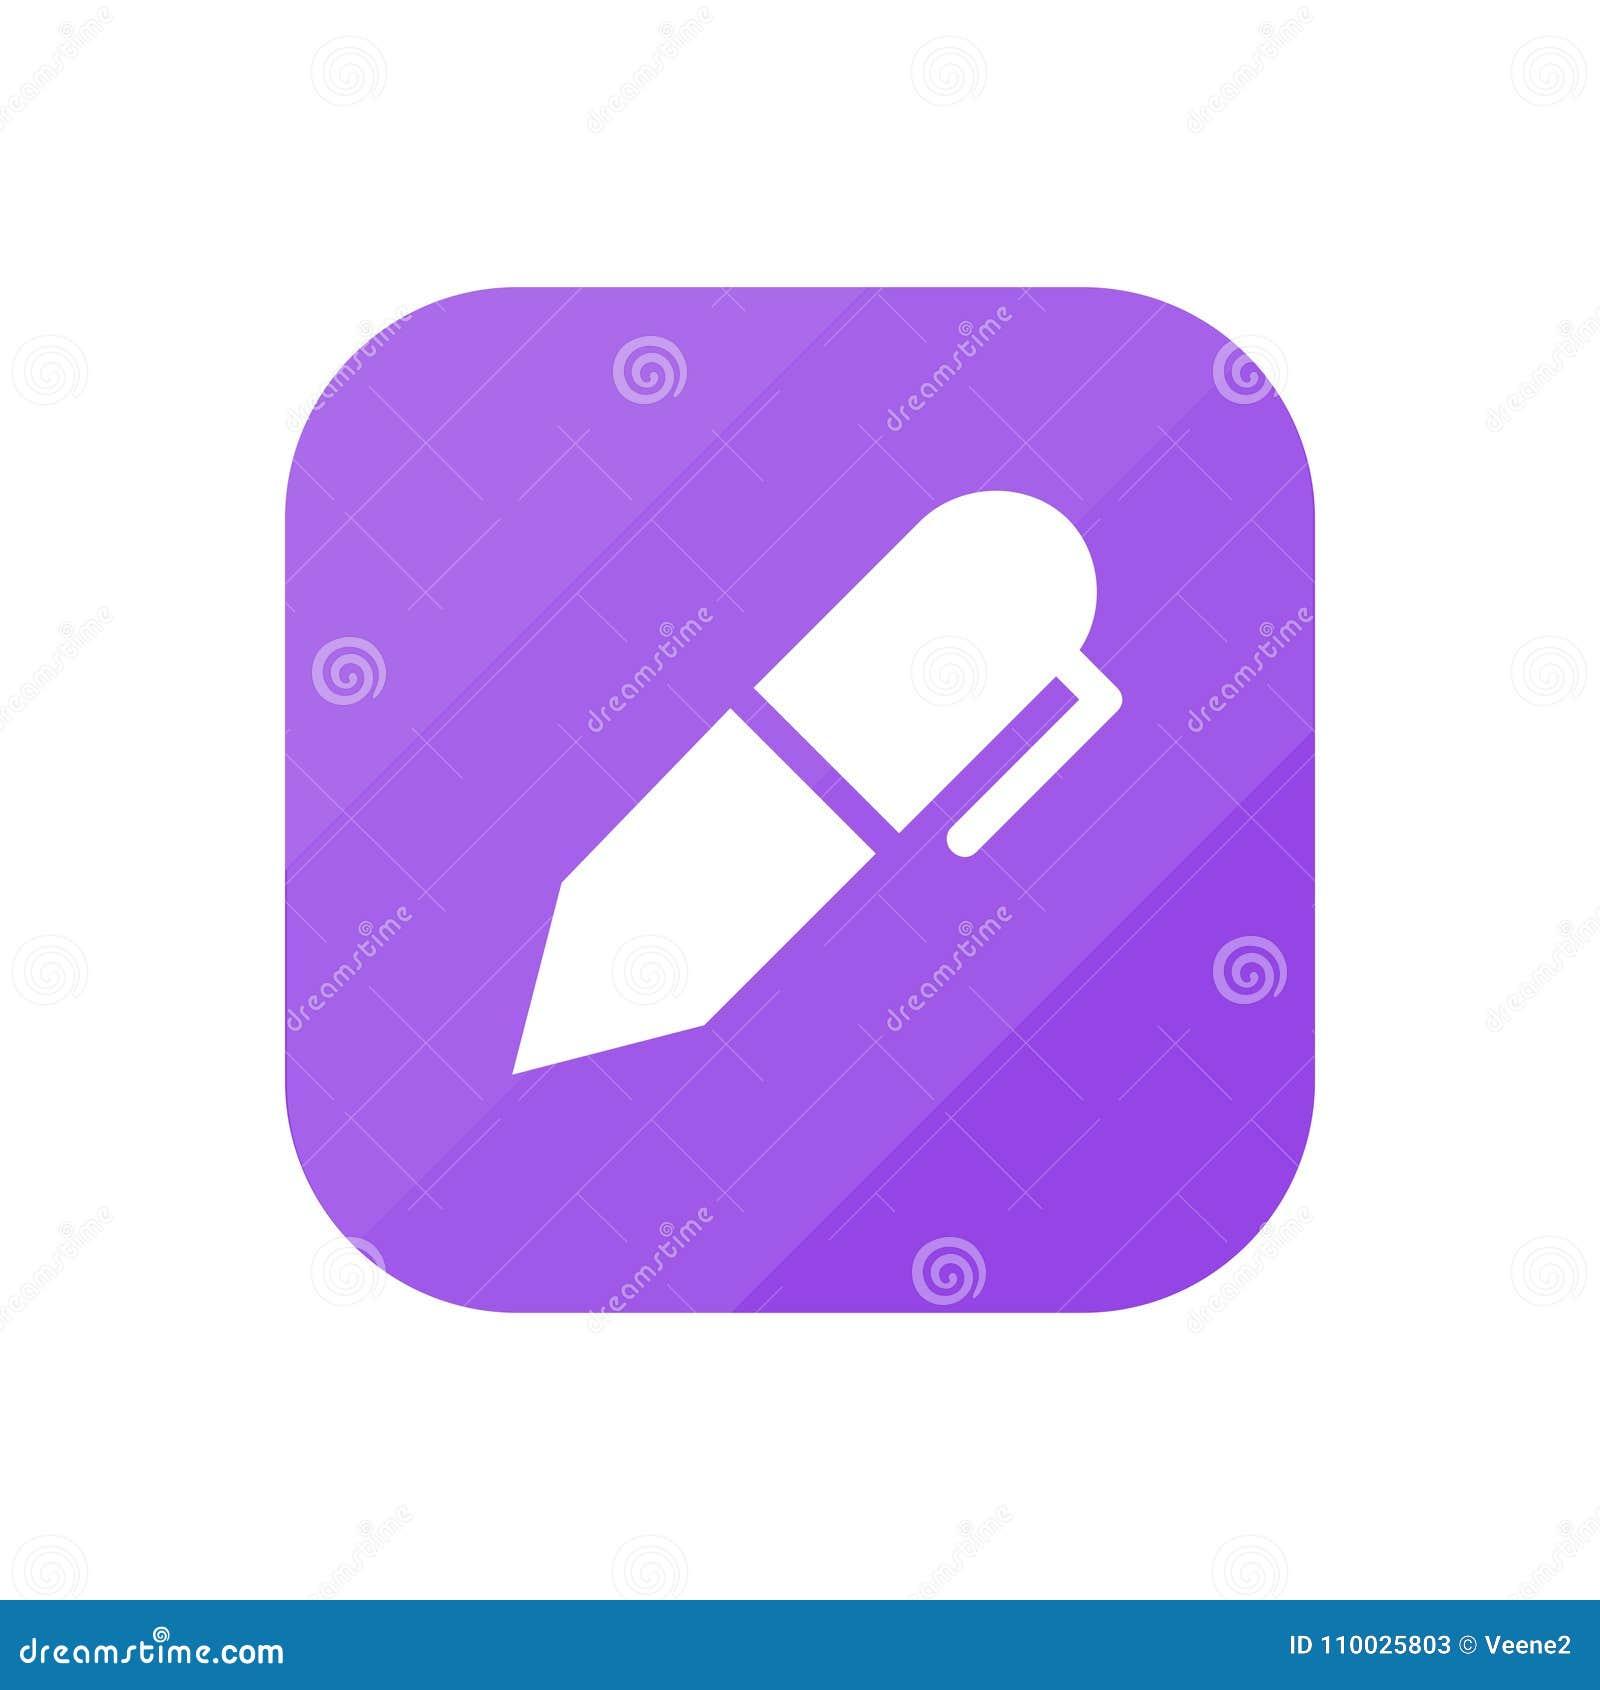 Pen - App Pictogram